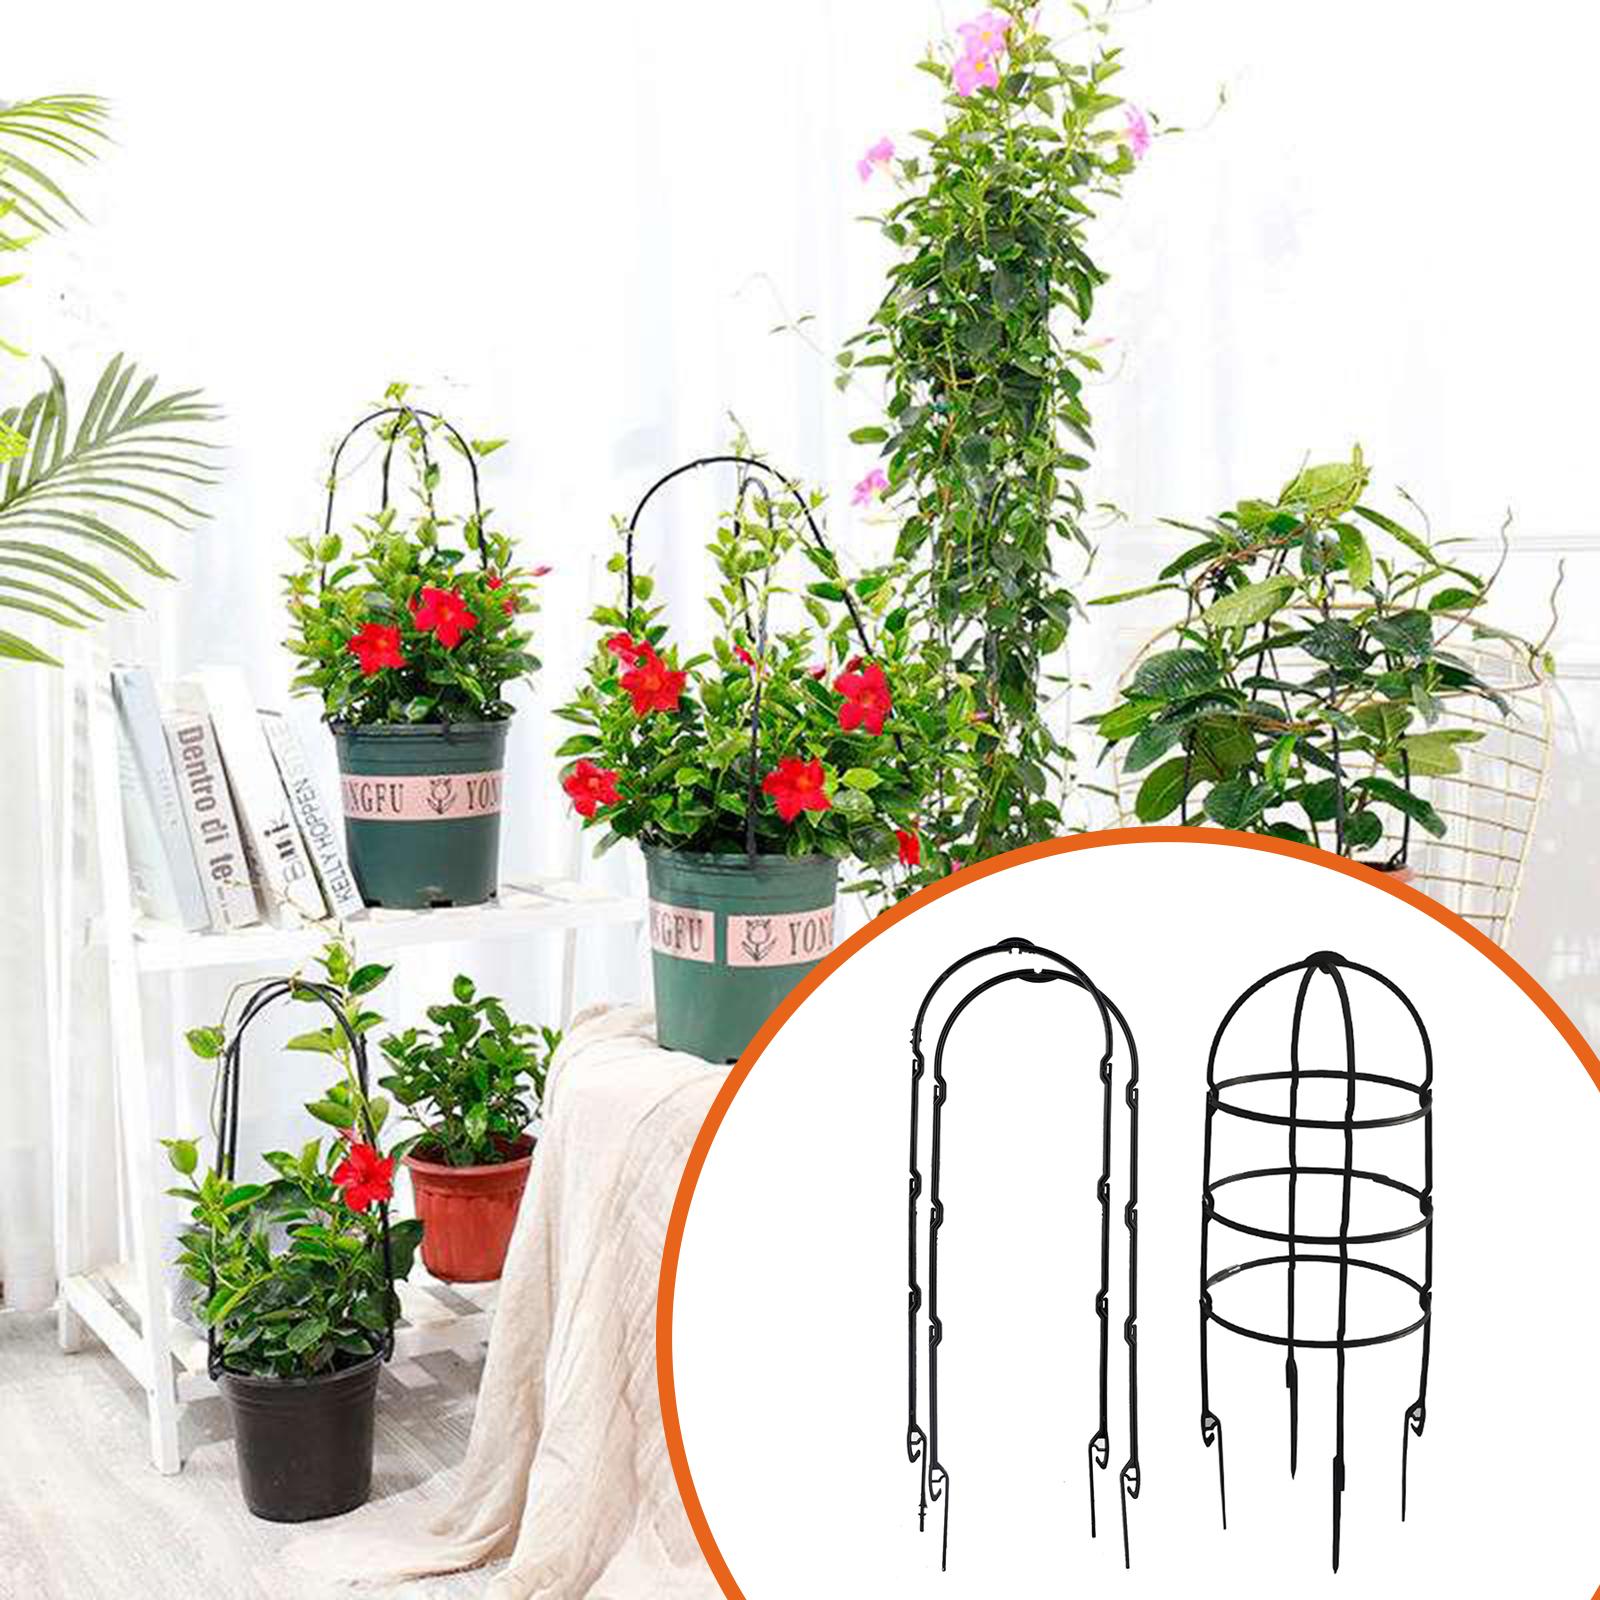 【On Sale】8pcs Durable Climbing Plant Support Cage Garden Trellis Obelisk Garden Trellis Flower Tomato Climbing Plants Flower Support Frame Gardening Tools Shelf U-Hoops Stakes Plant Cage